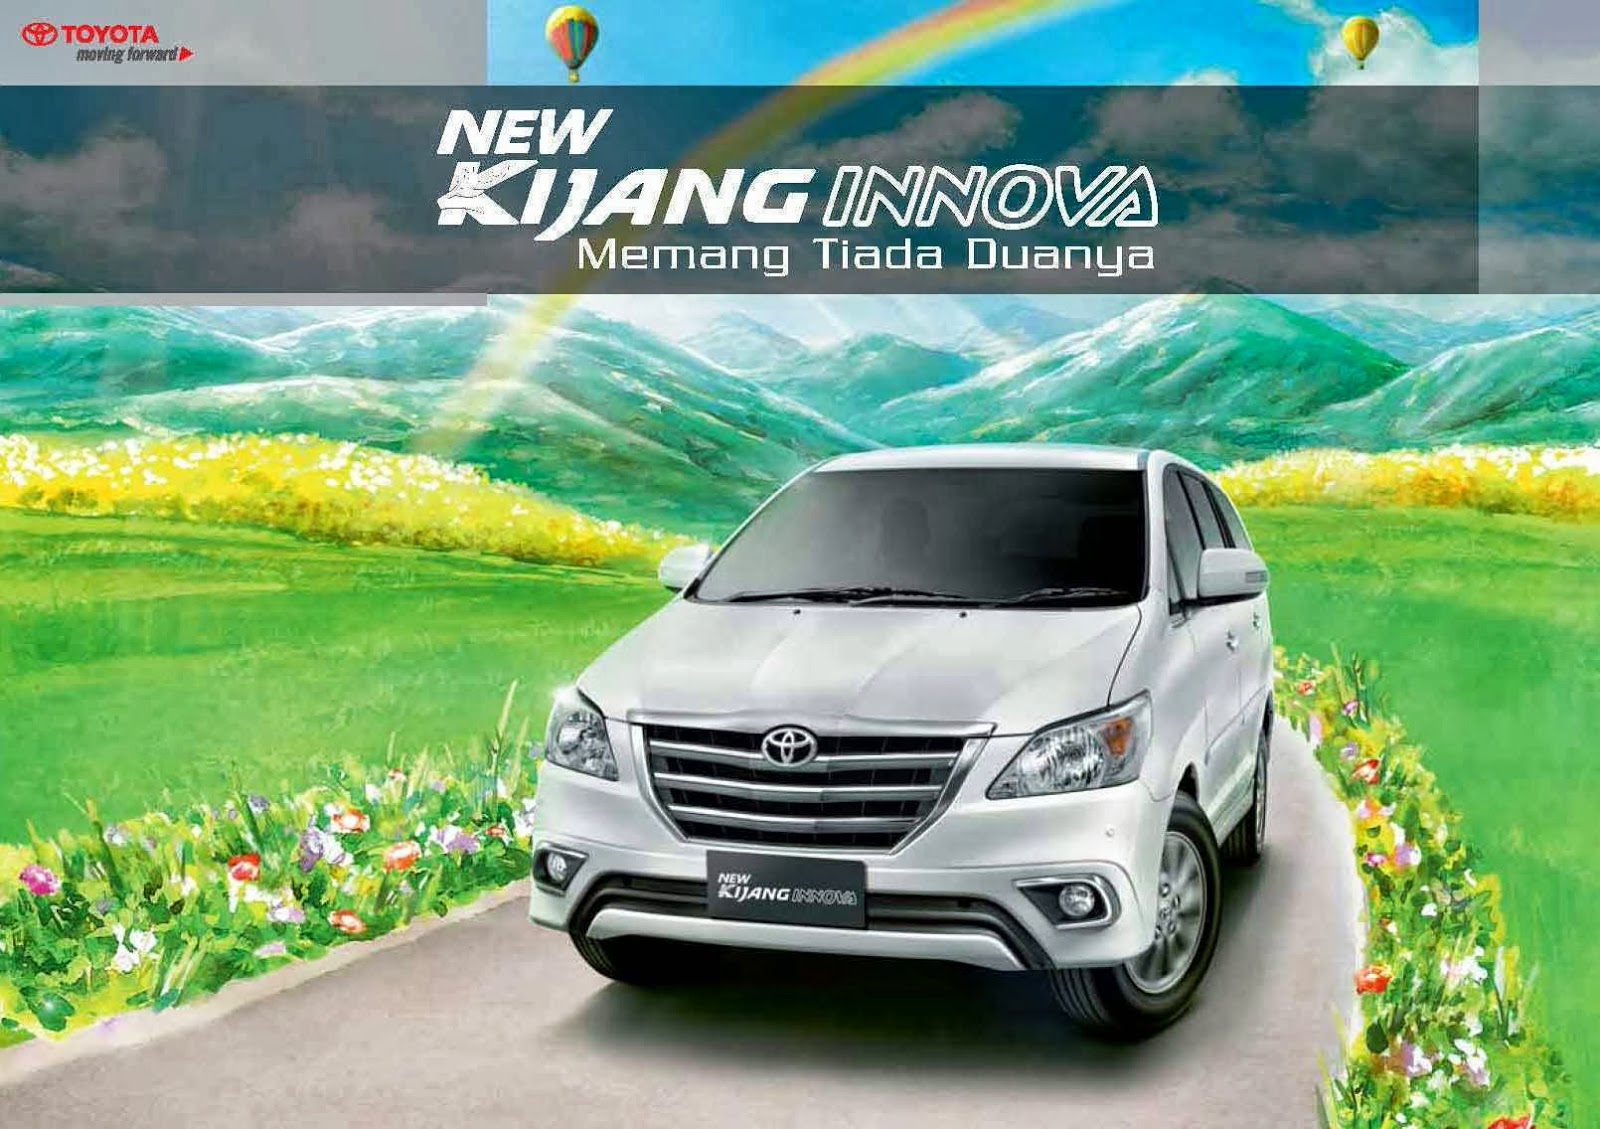 All New Kijang Innova Harga Modifikasi Grand Avanza Hitam Brosur Toyota 2016 Grill